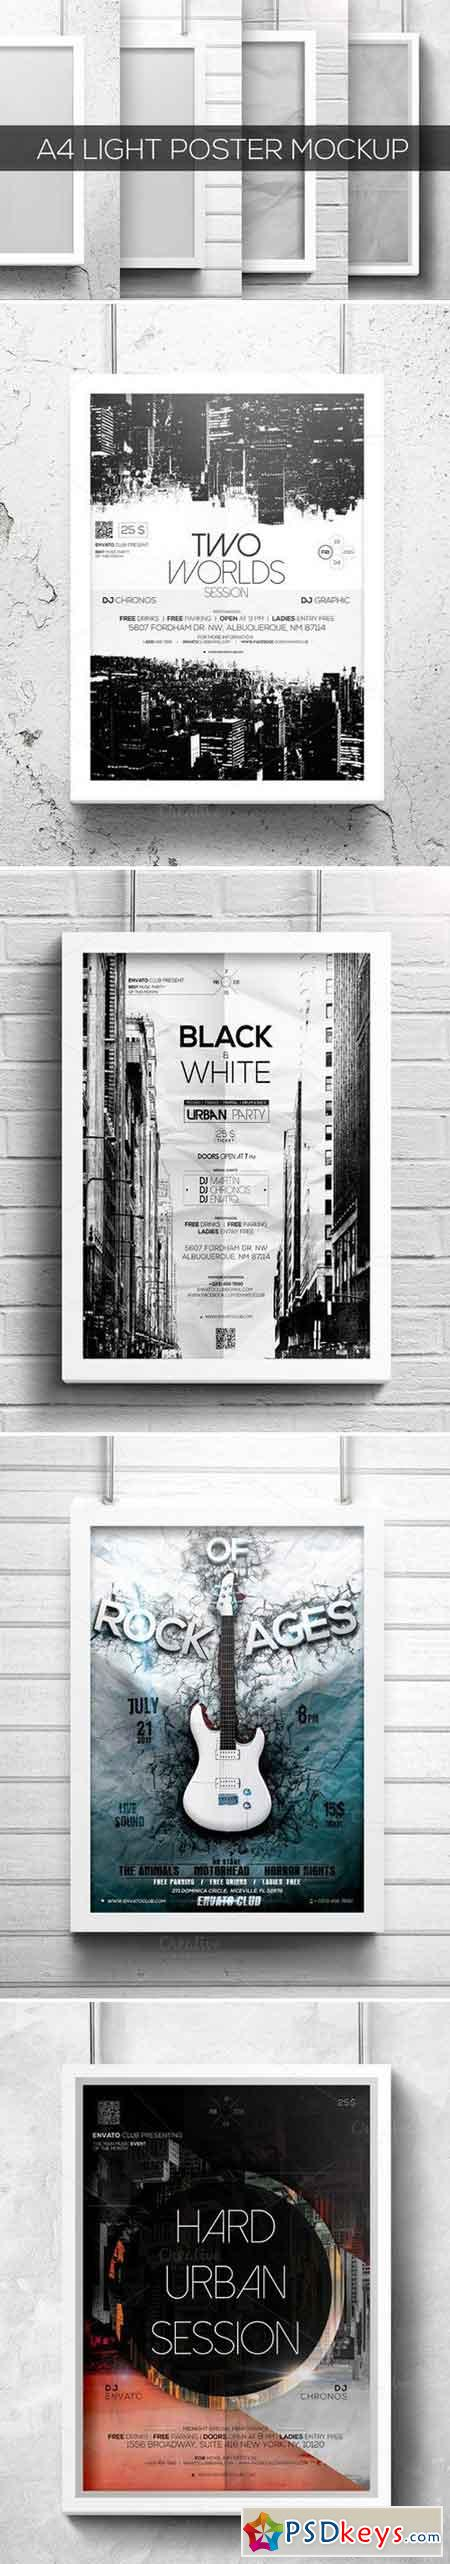 A4 Light Poster Mockup 1030993